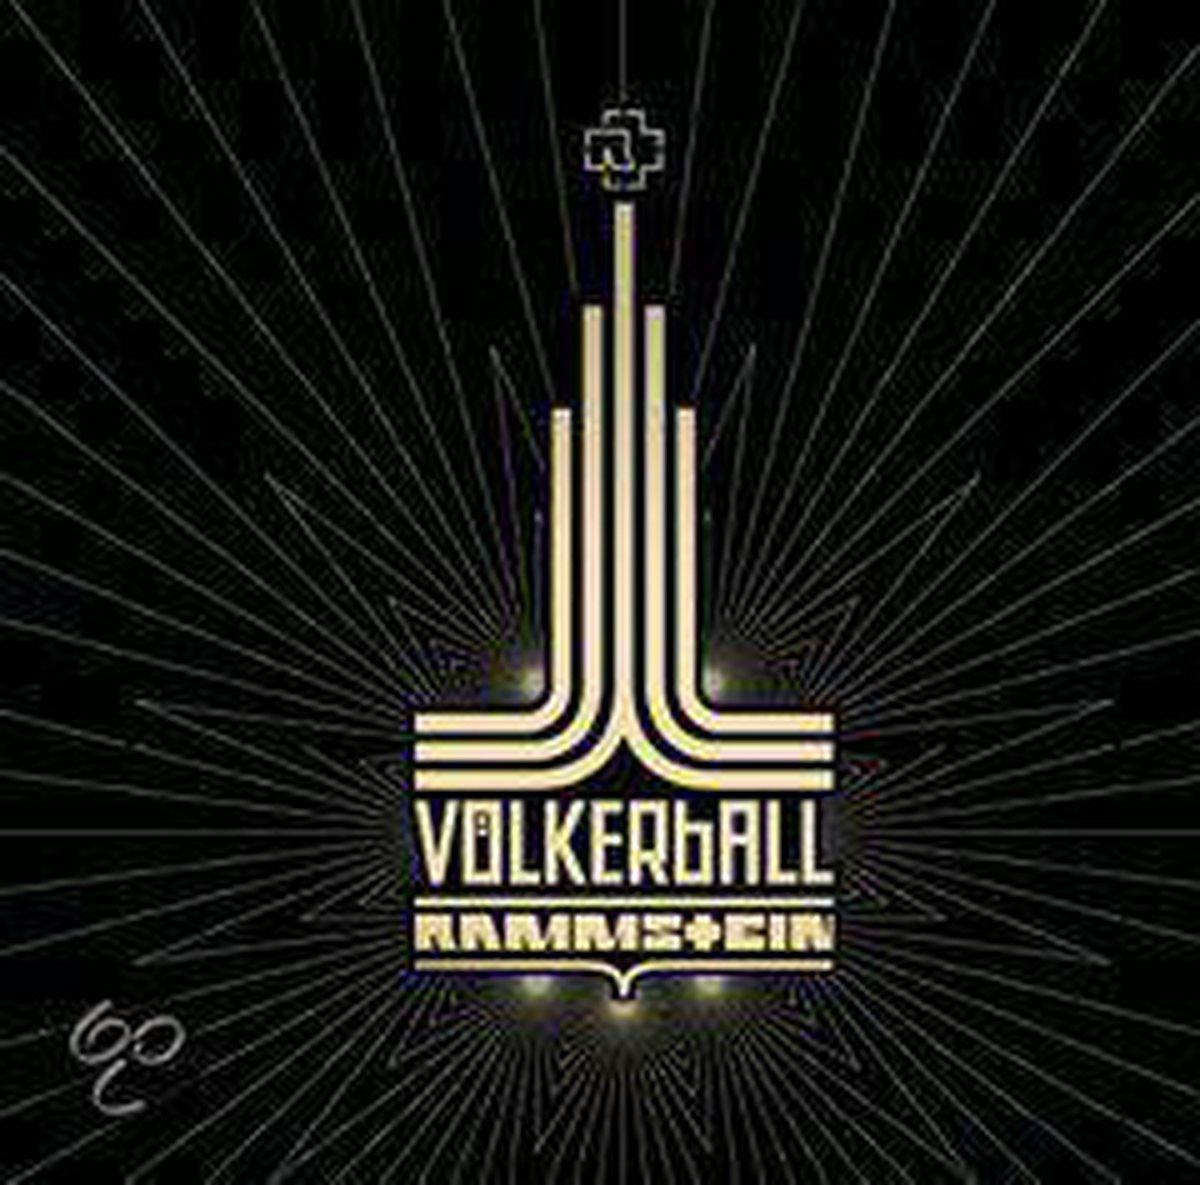 Völkerball + DVD - Rammstein